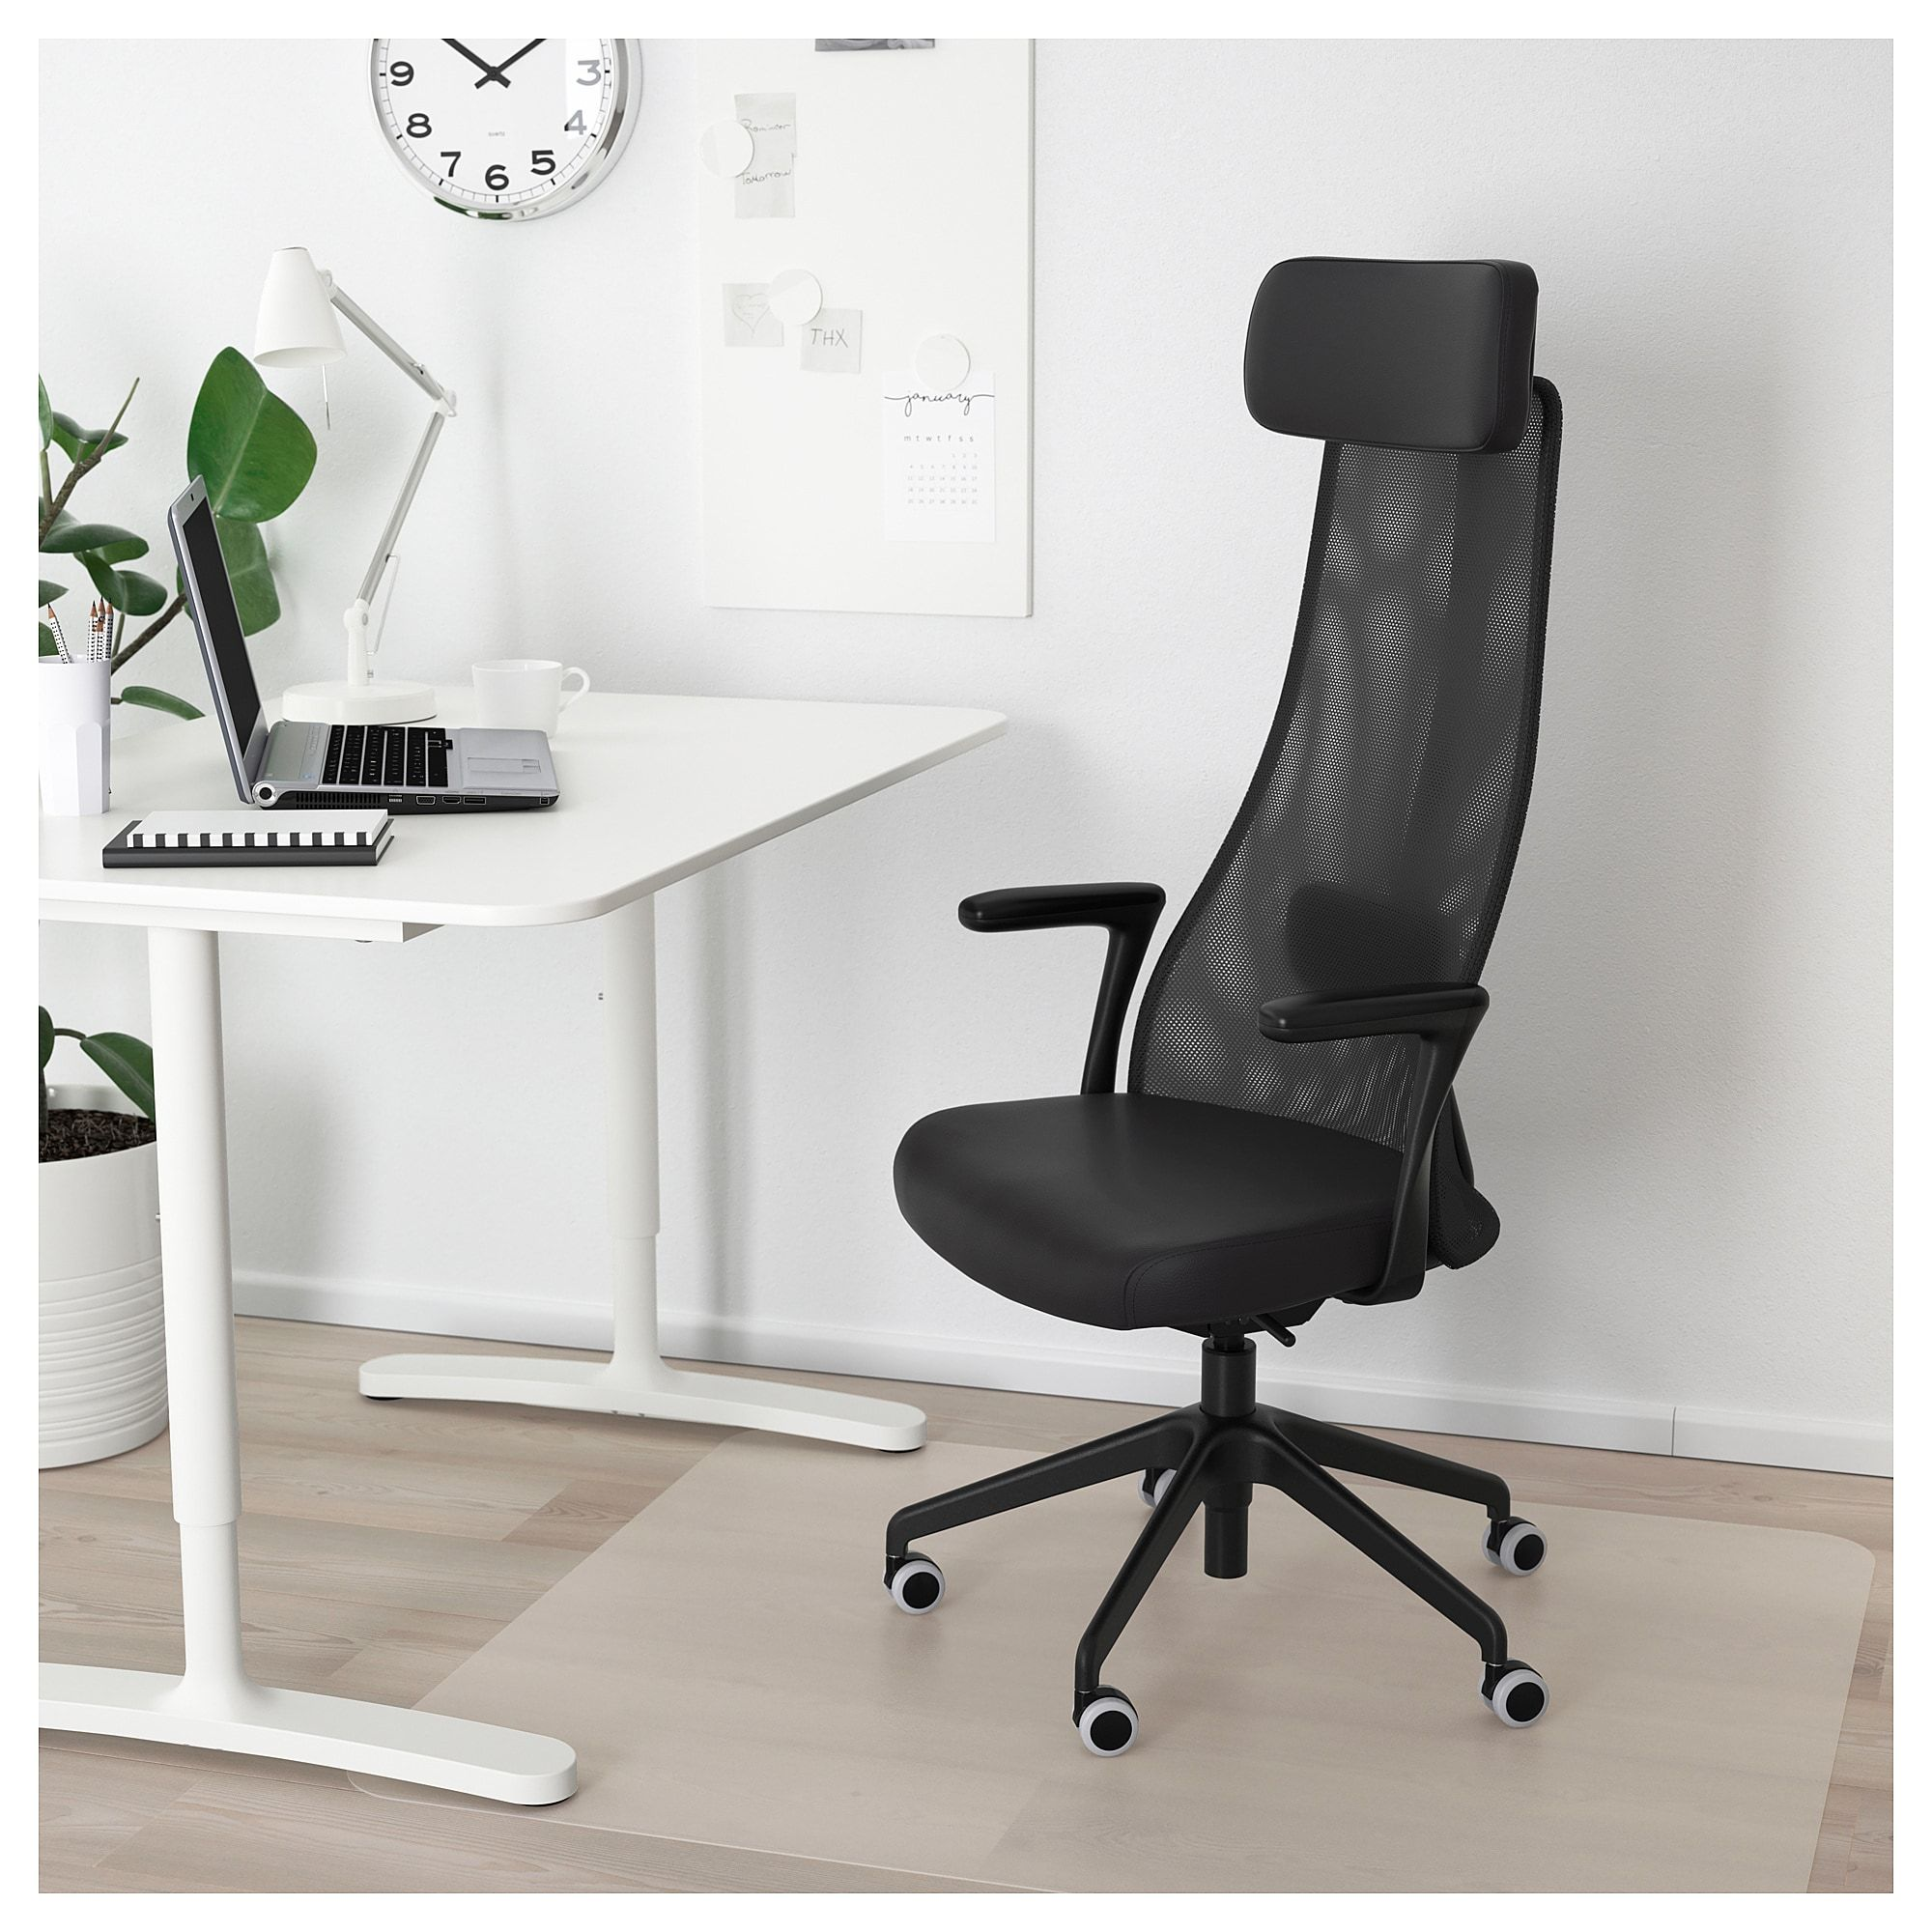 Fine Jarvfjallet Office Chair With Armrests Glose Black Ikea Creativecarmelina Interior Chair Design Creativecarmelinacom